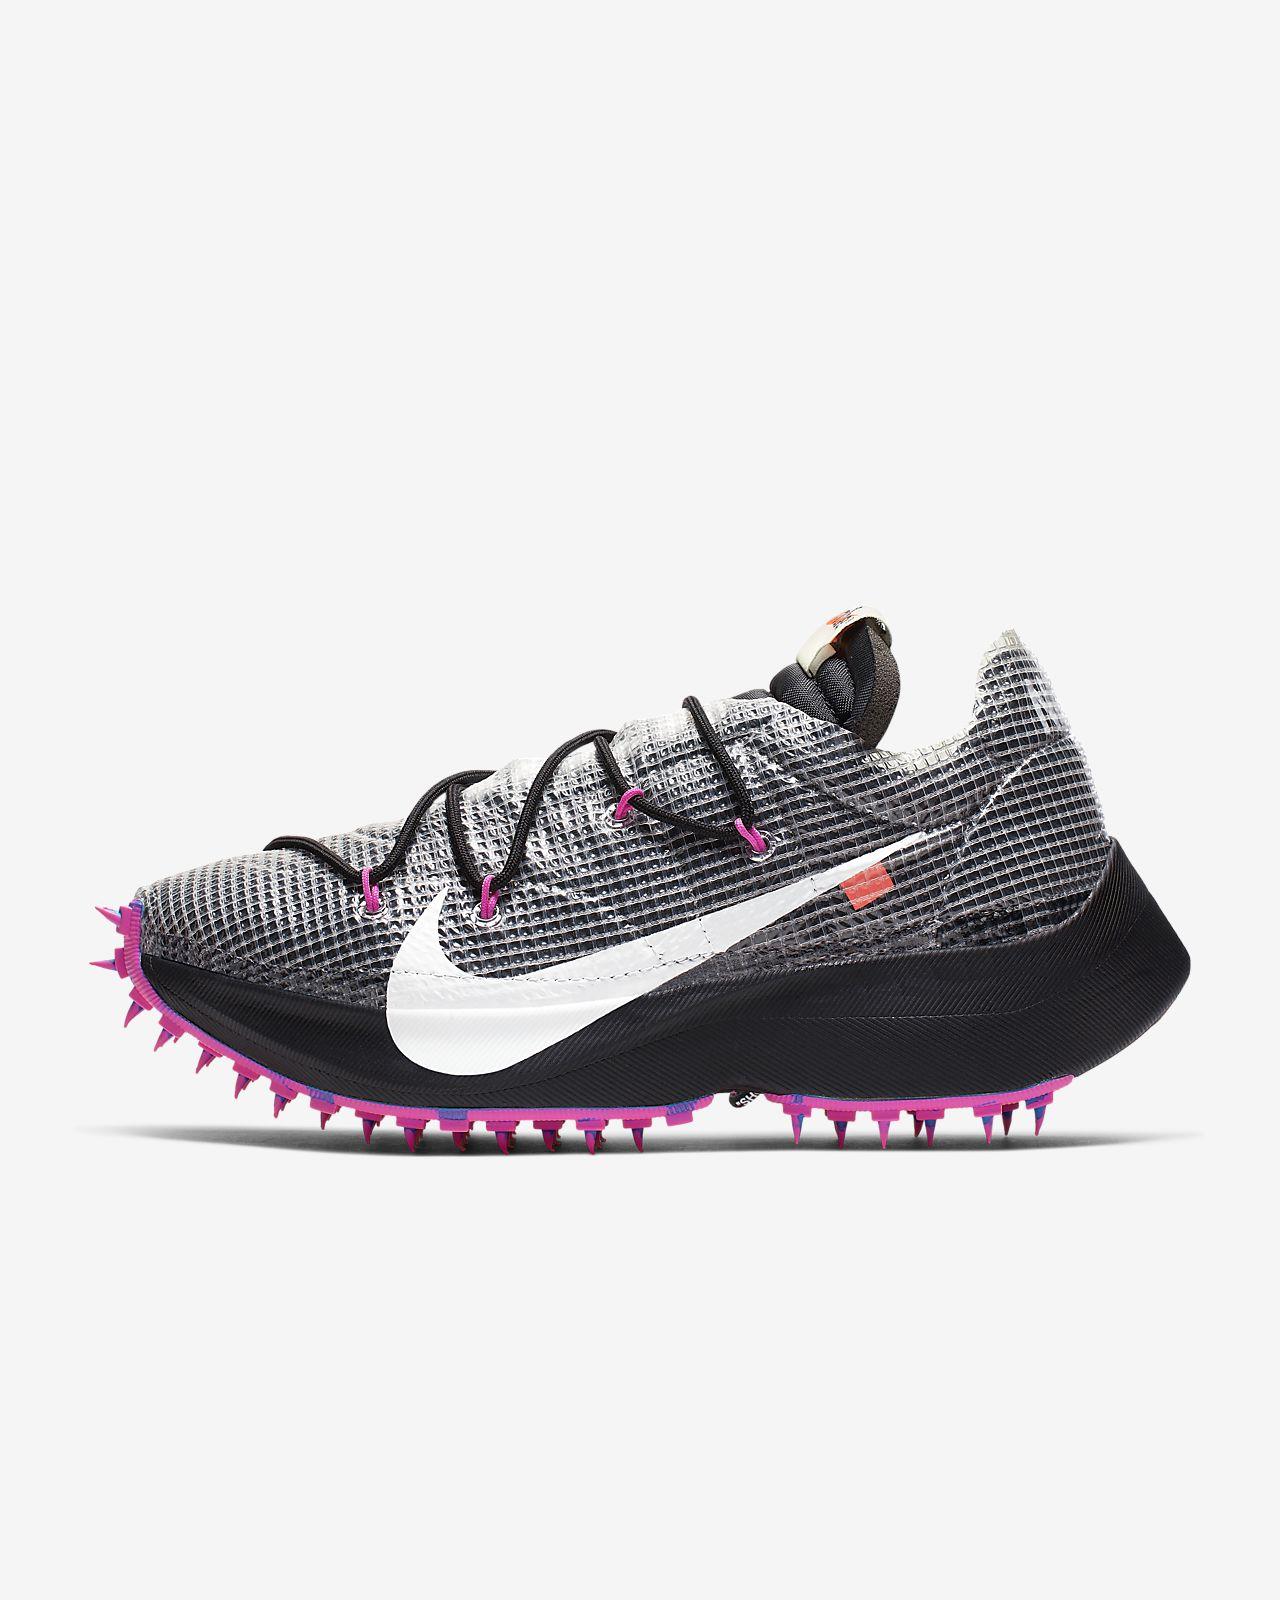 Calzado para mujer Nike x Off-White™ Vapor Street